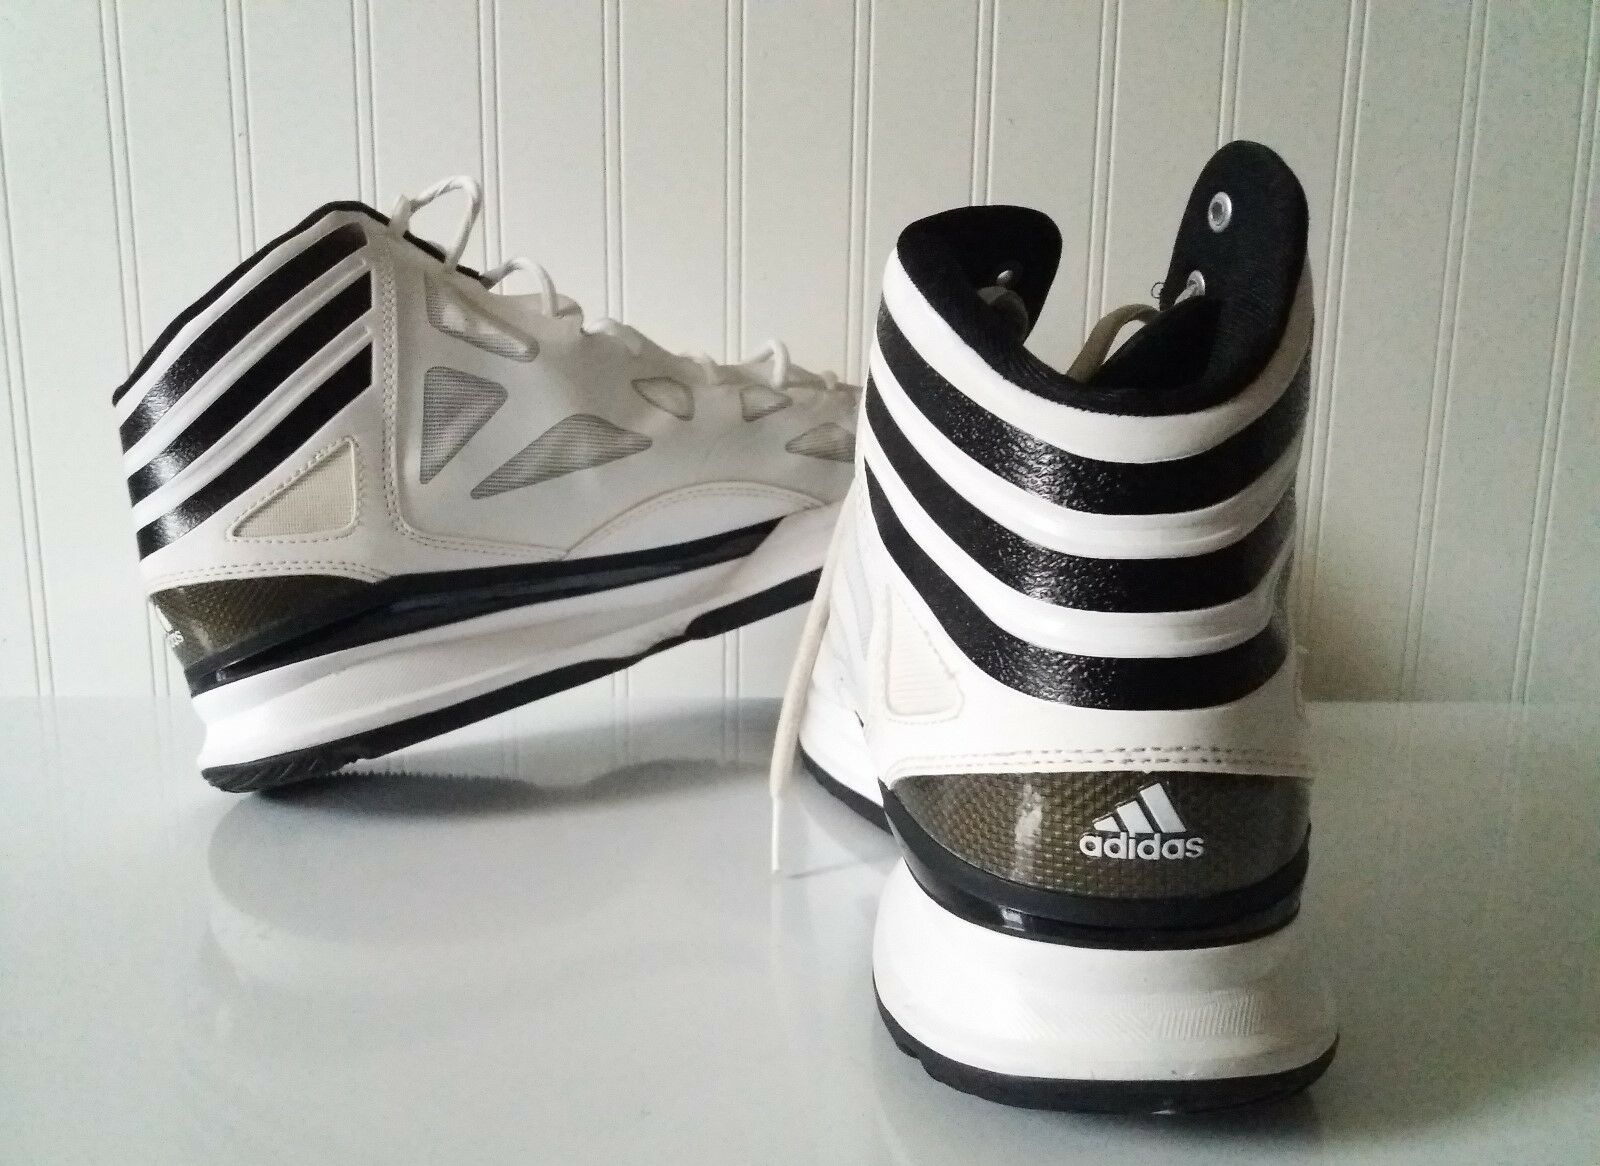 Price reduction Adidas US size 16 White with Black Stripes Men's Shoe Cheap women's shoes women's shoes